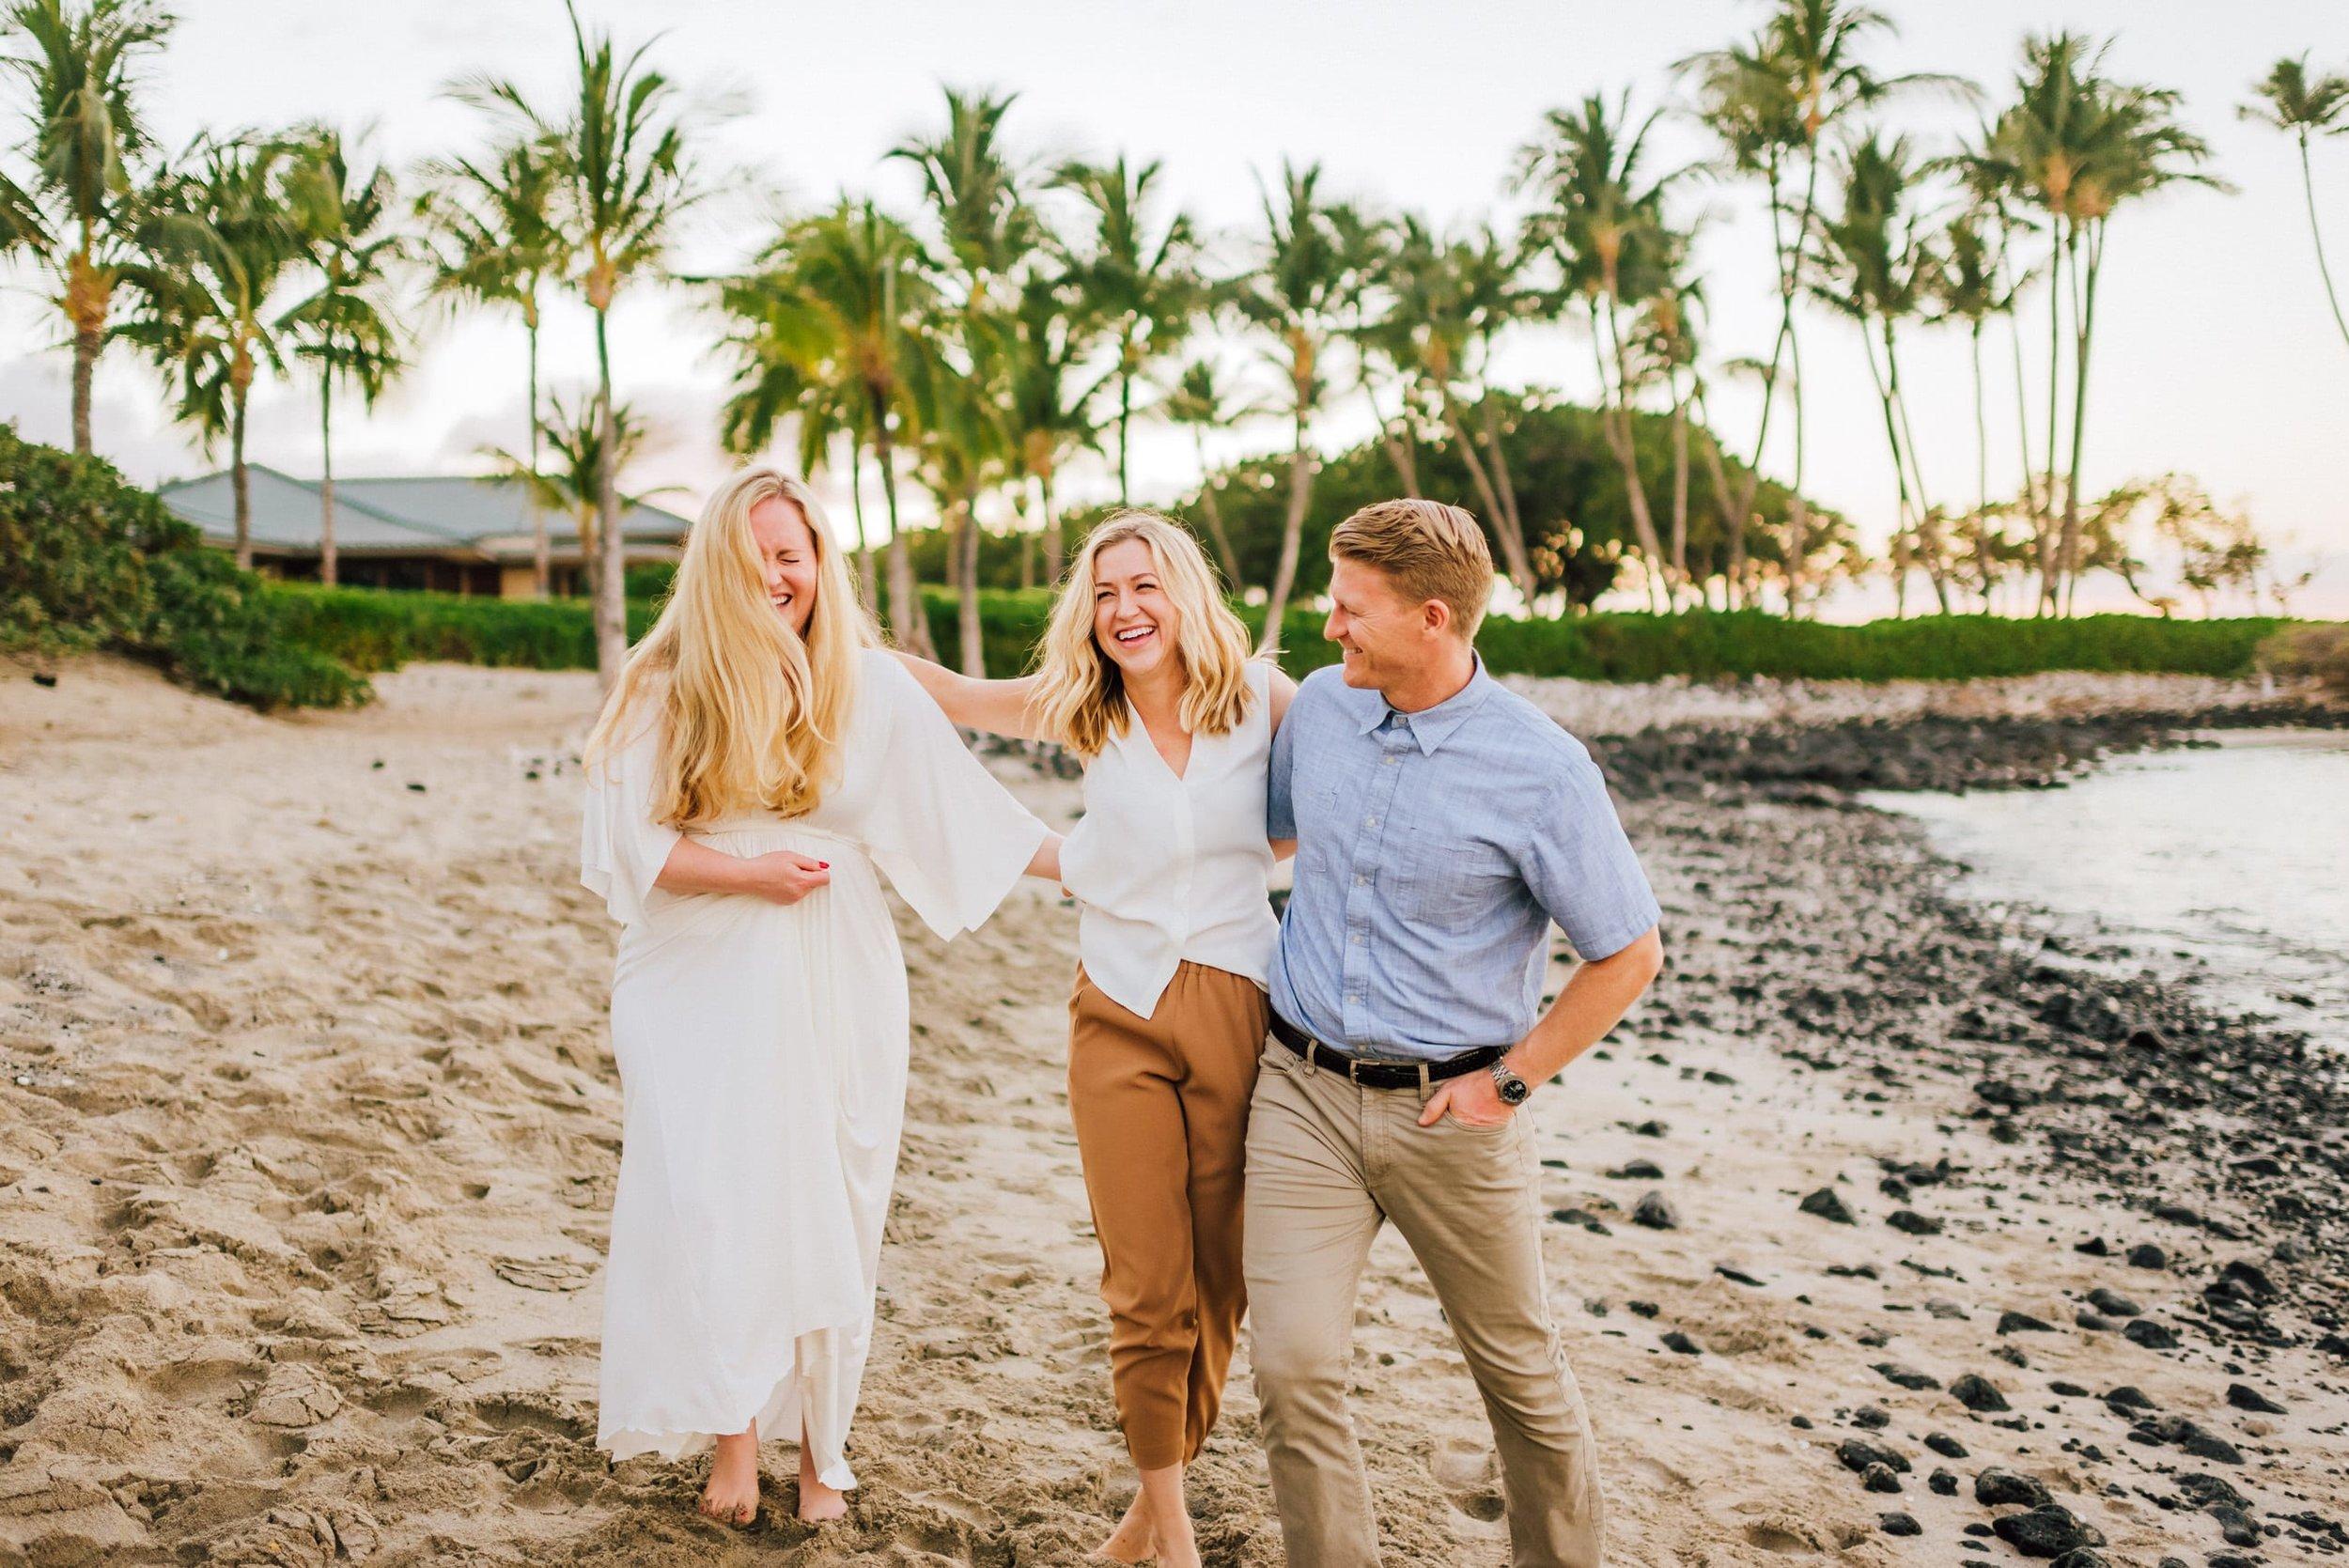 Hawaii-Family-Photographer-Waikoloa-Fairmont-Hualalai-Mauna-Kea-40.jpg